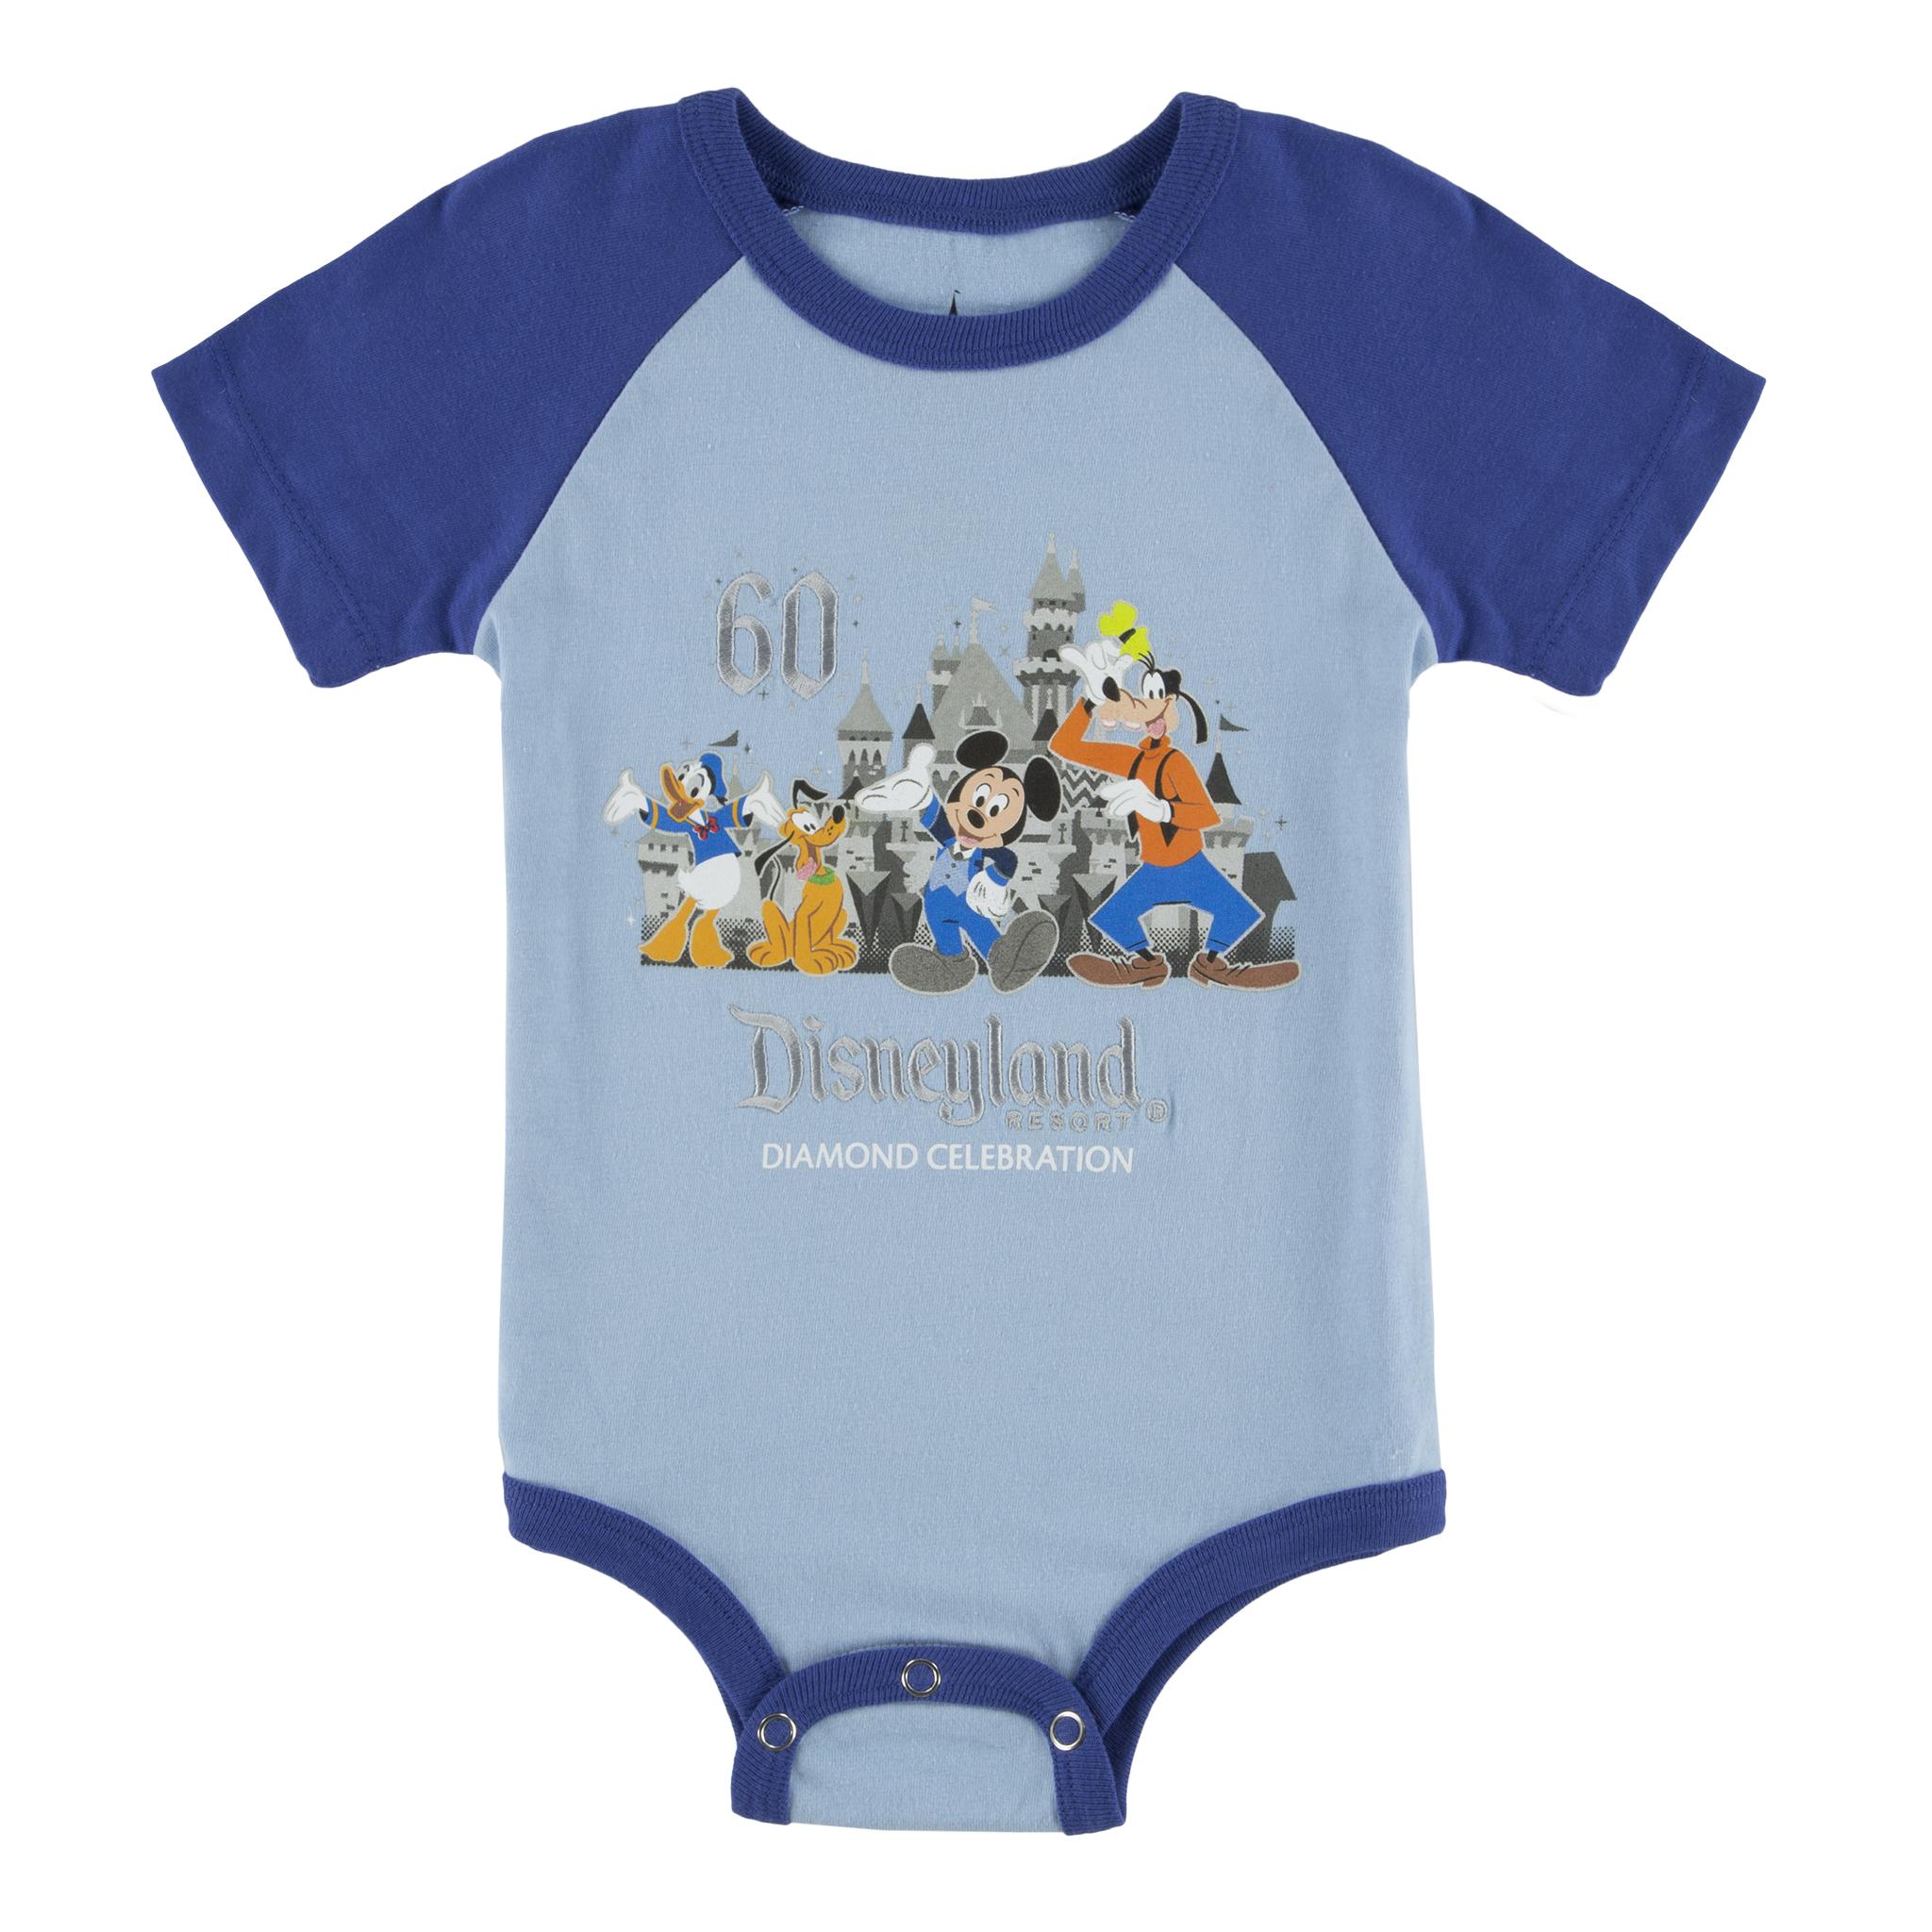 Disney Parks Recalls Infant Bodysuits